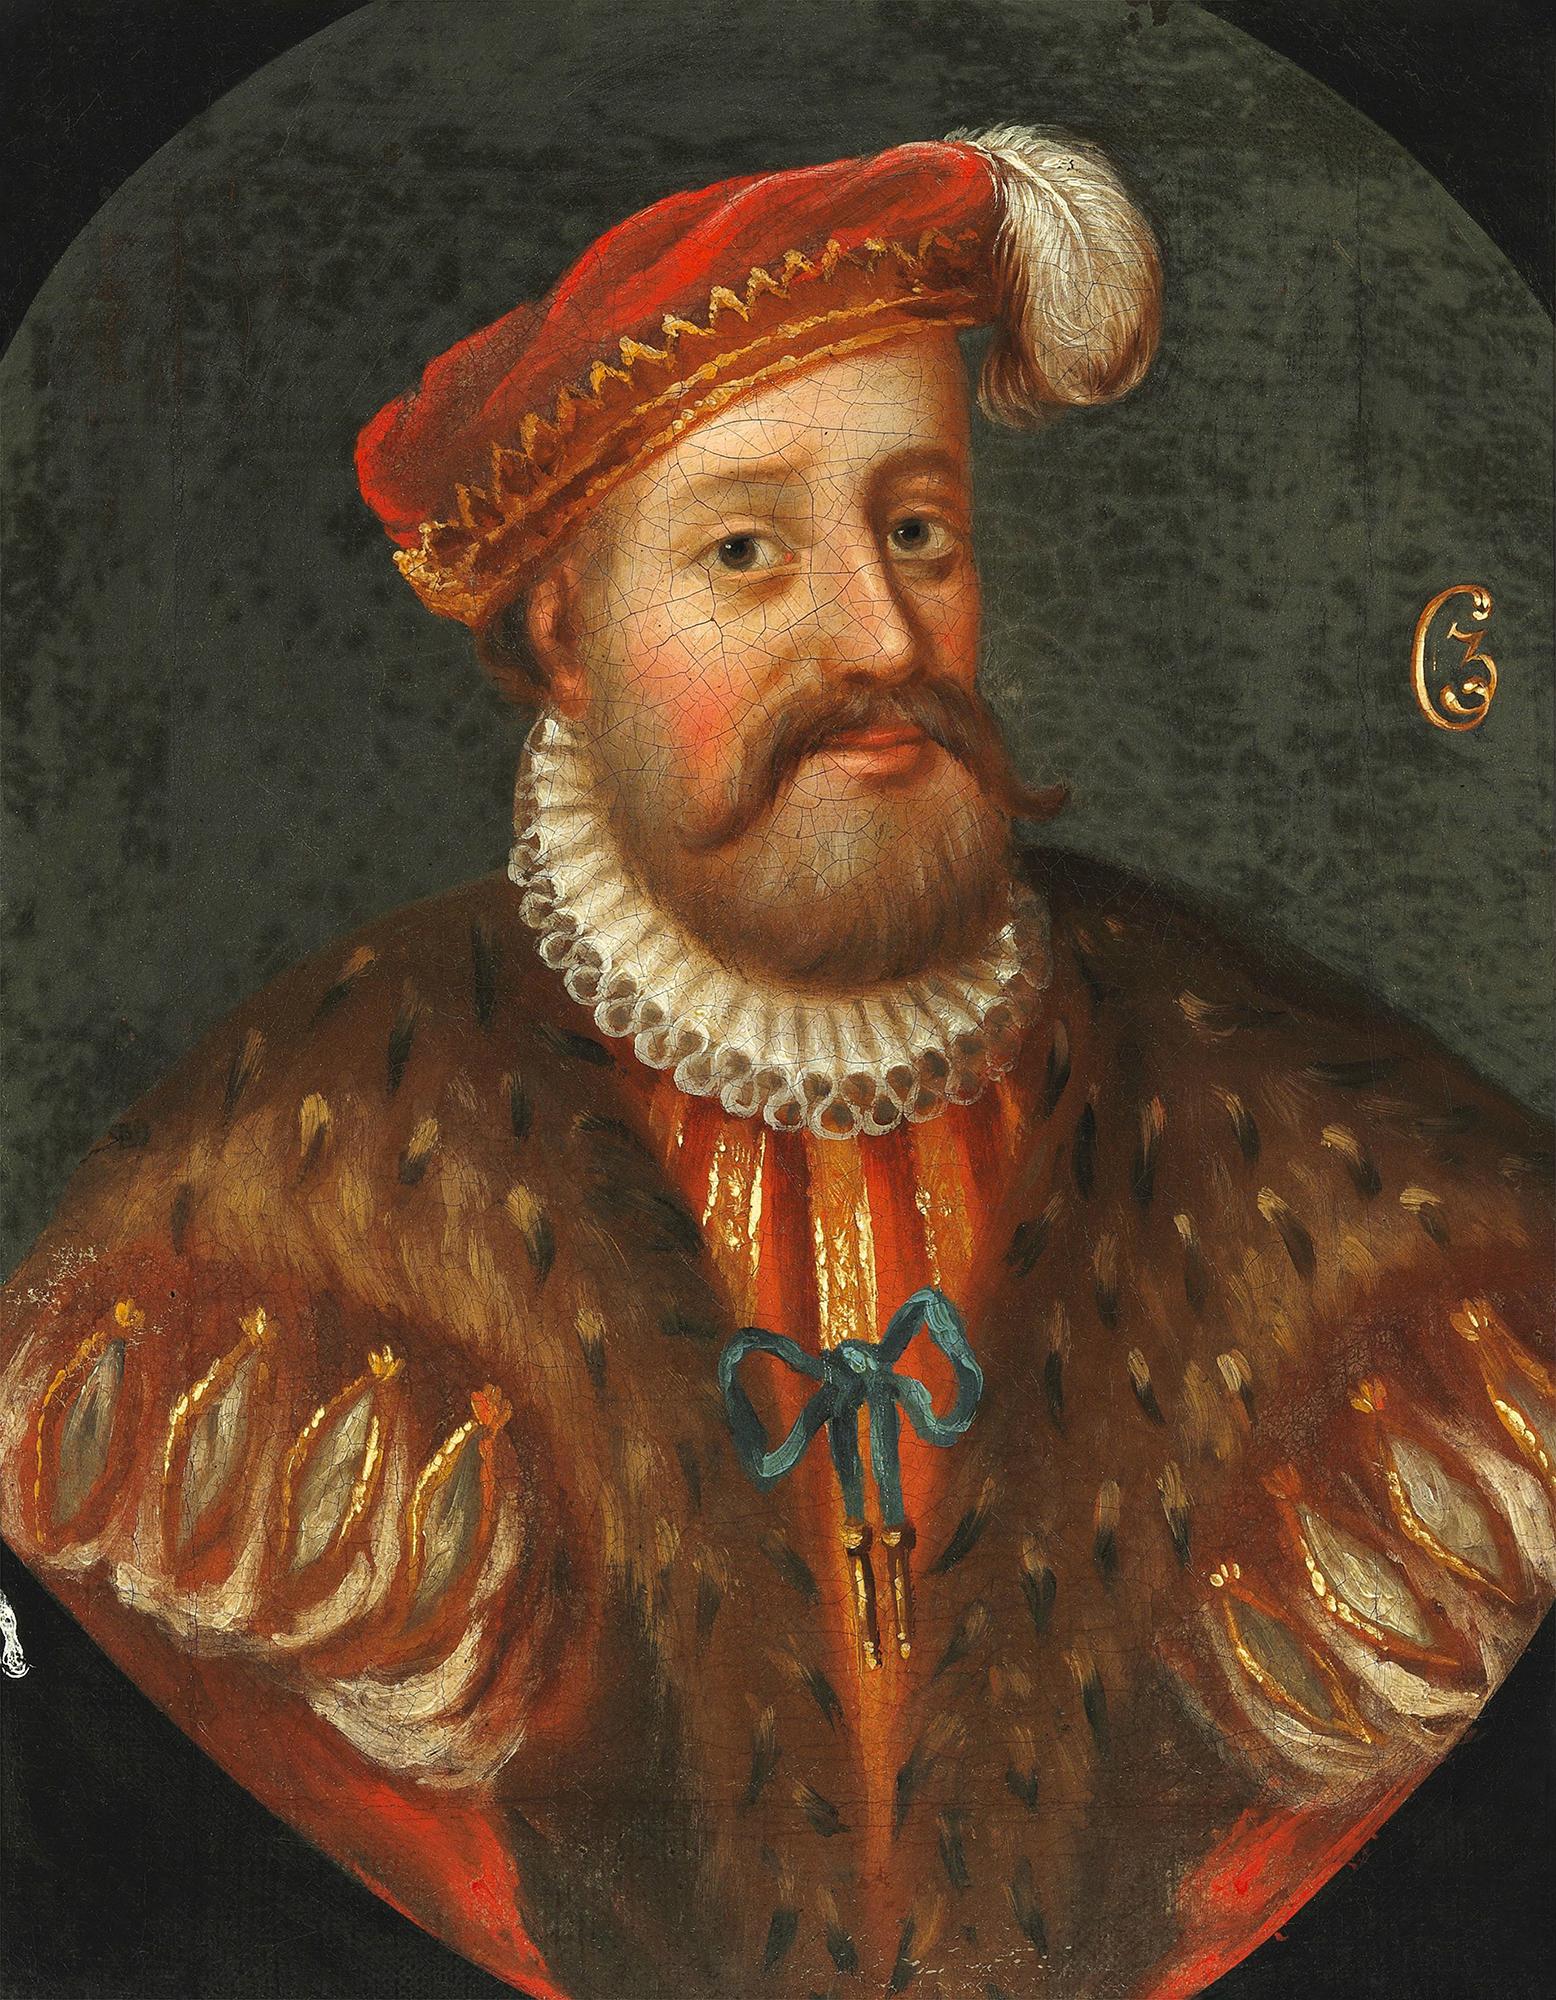 Файл:Christian III (1503-1559).jpg